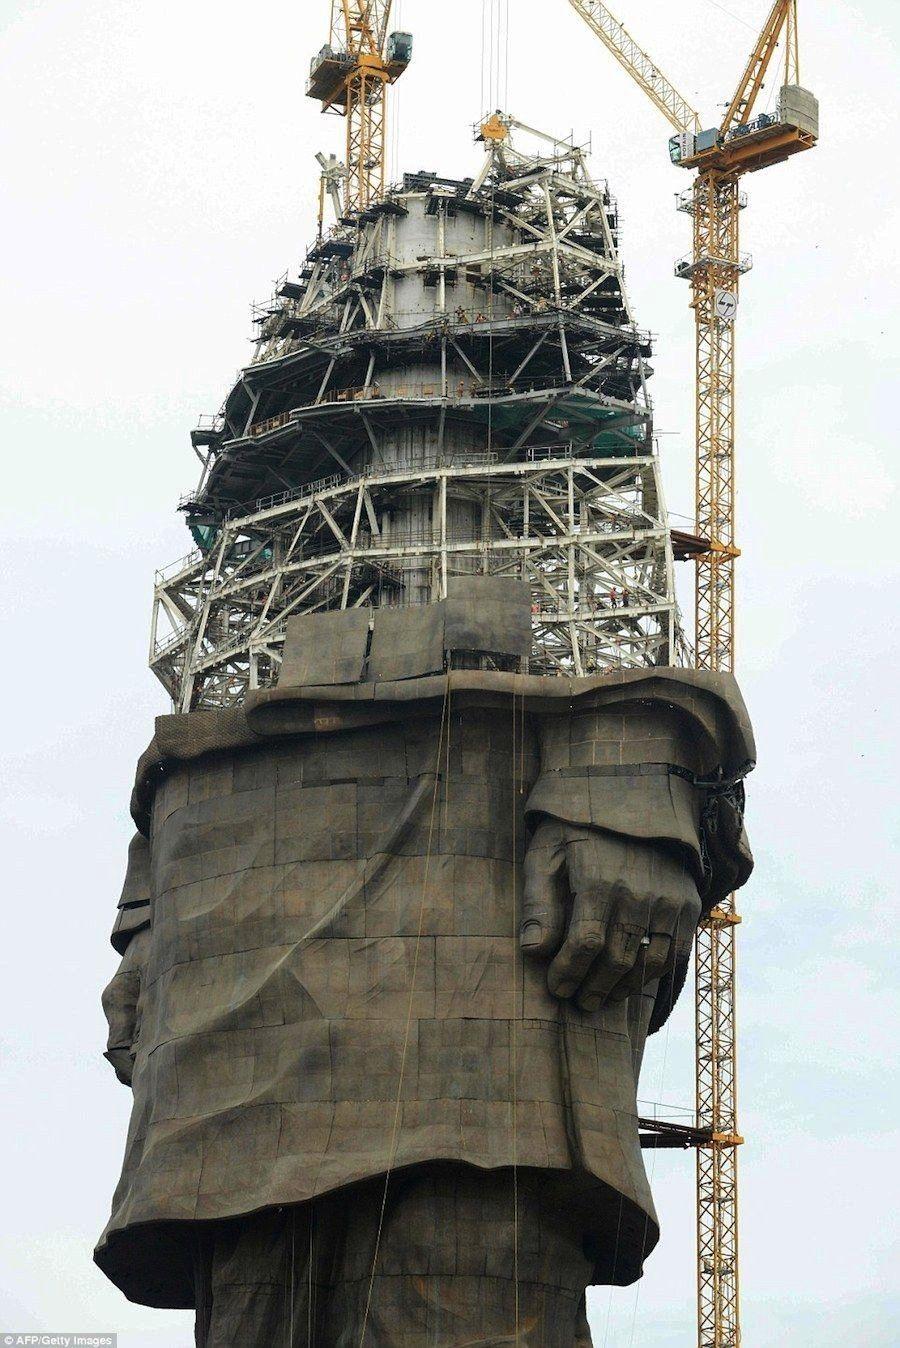 estatua mas alta del mundo esta por terminarse. Medira 597 pies ( 182 m) de altura, sera casi..